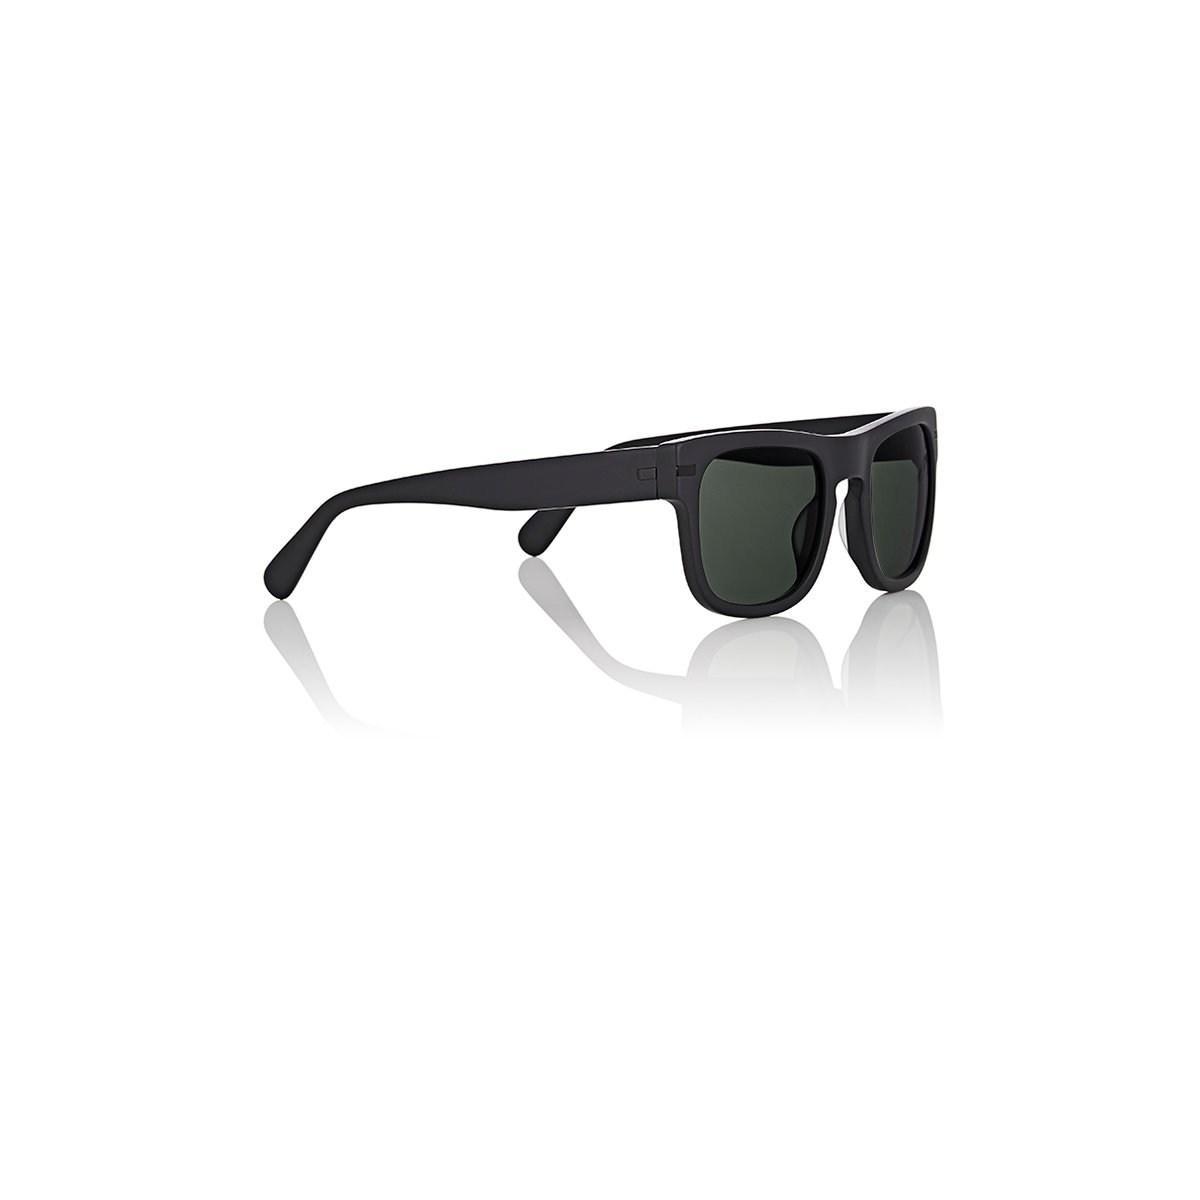 08ab301270f62 Moscot - Black Type One Sunglasses for Men - Lyst. View fullscreen